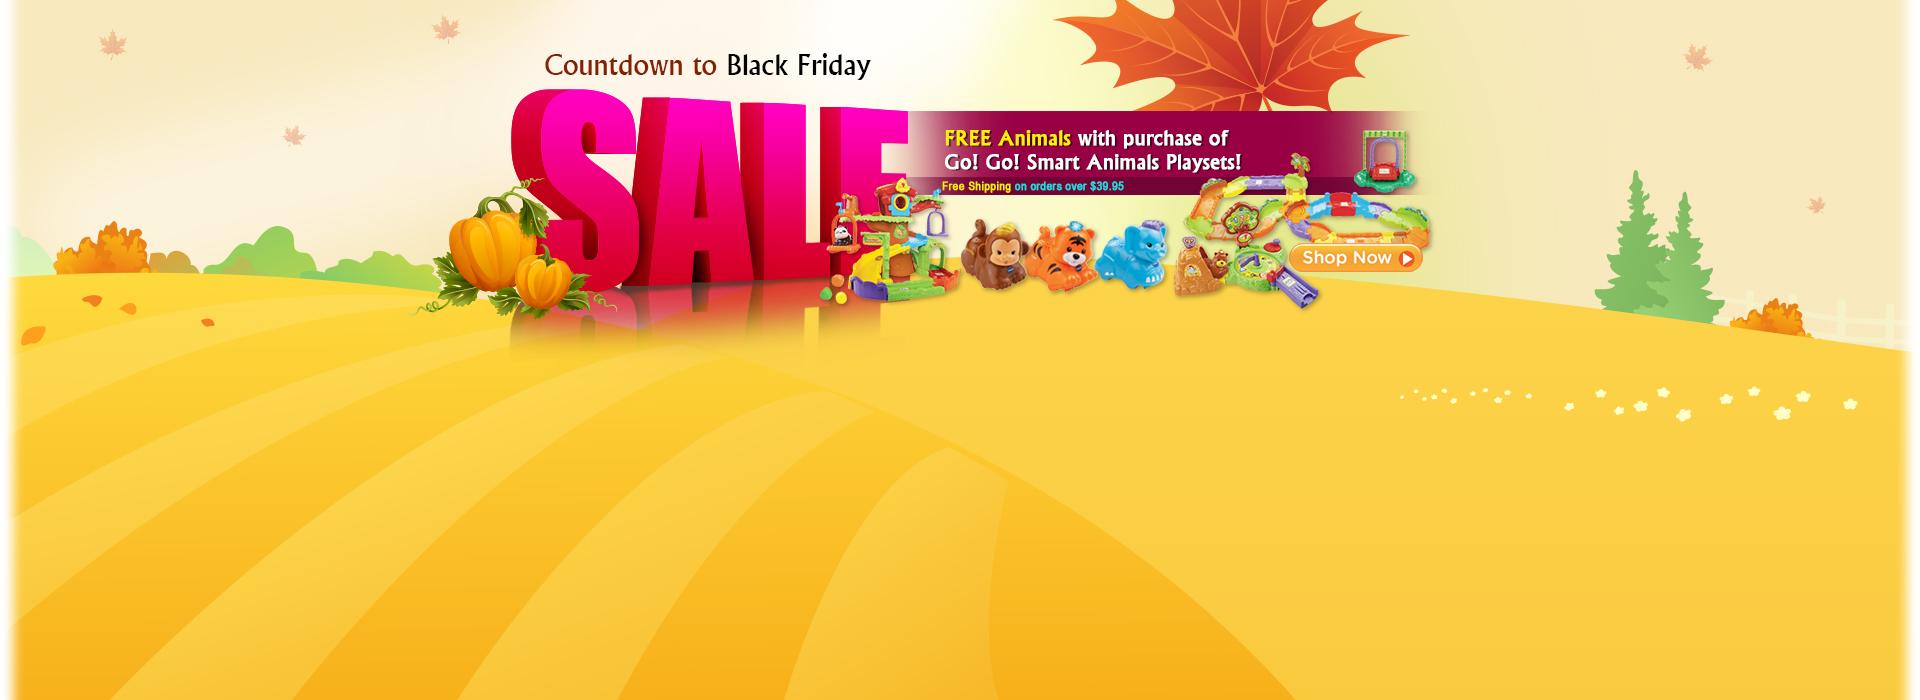 Countdown to Black Friday Sale - Go! Go! Smart Animals Deals